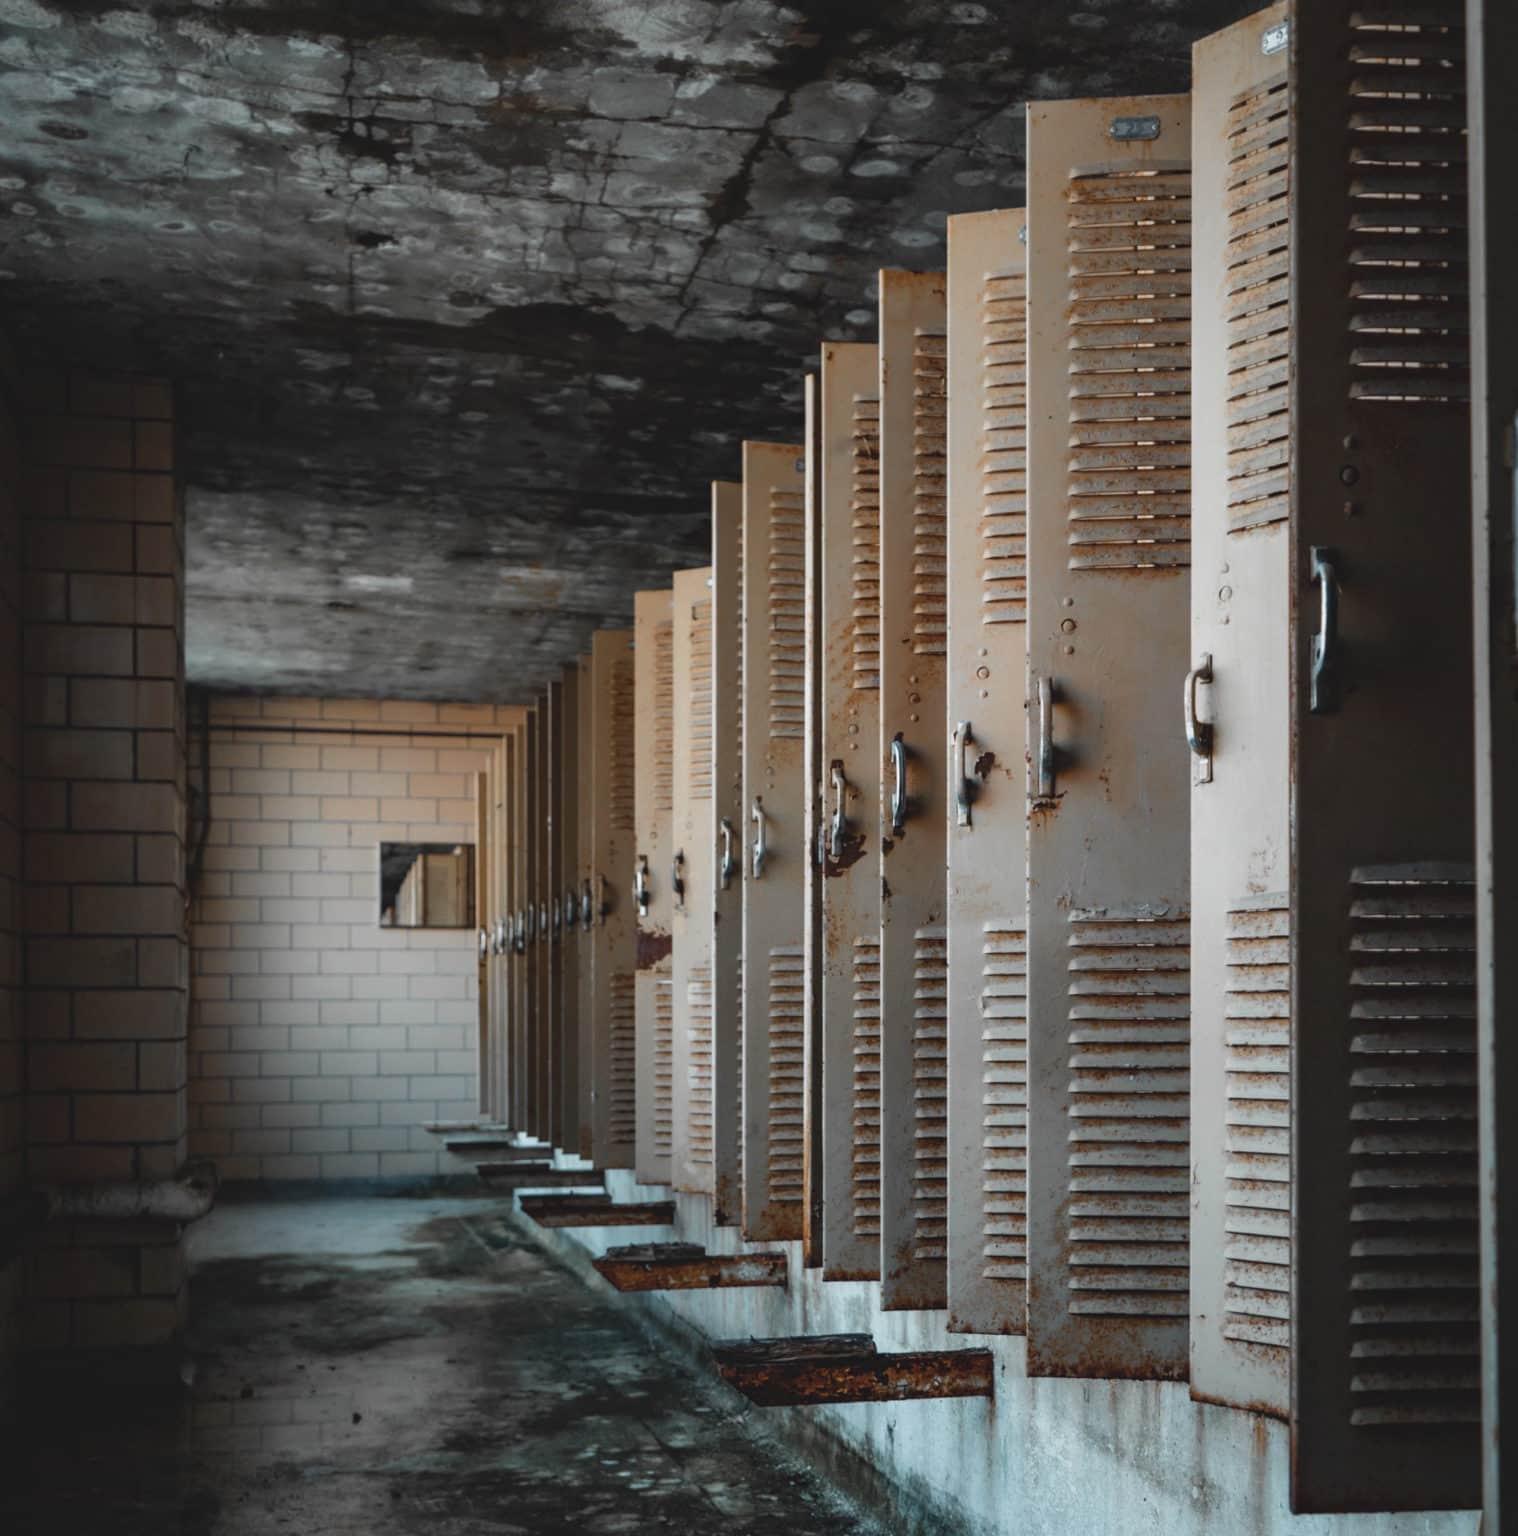 iCloud backups locker room